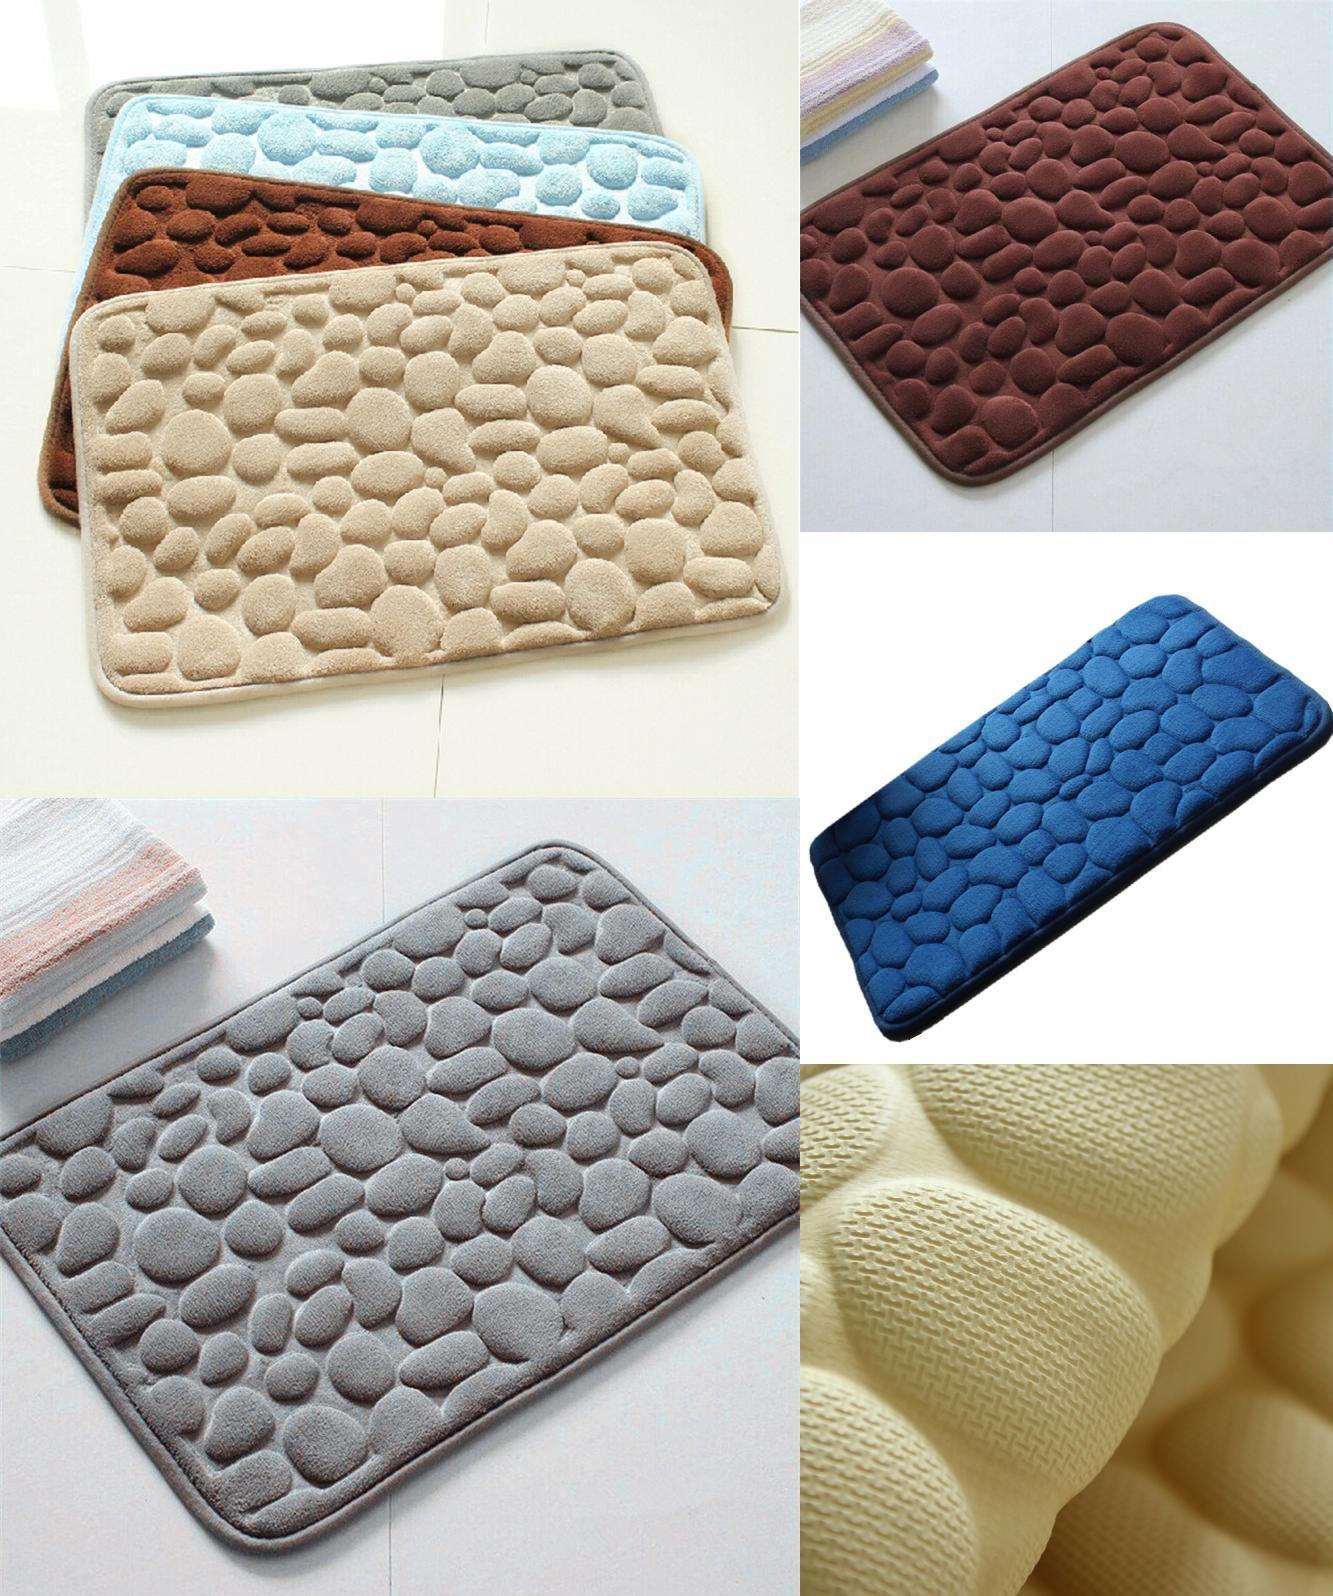 Visit To Buy 3d Bath Rug Pebbles Natural Sbr Rubber Bath Mat Bottom Space Memory Cotton Rebound Mat Super Absorbent Advert Rubber Bath Mat Bath Rug Bath Mat